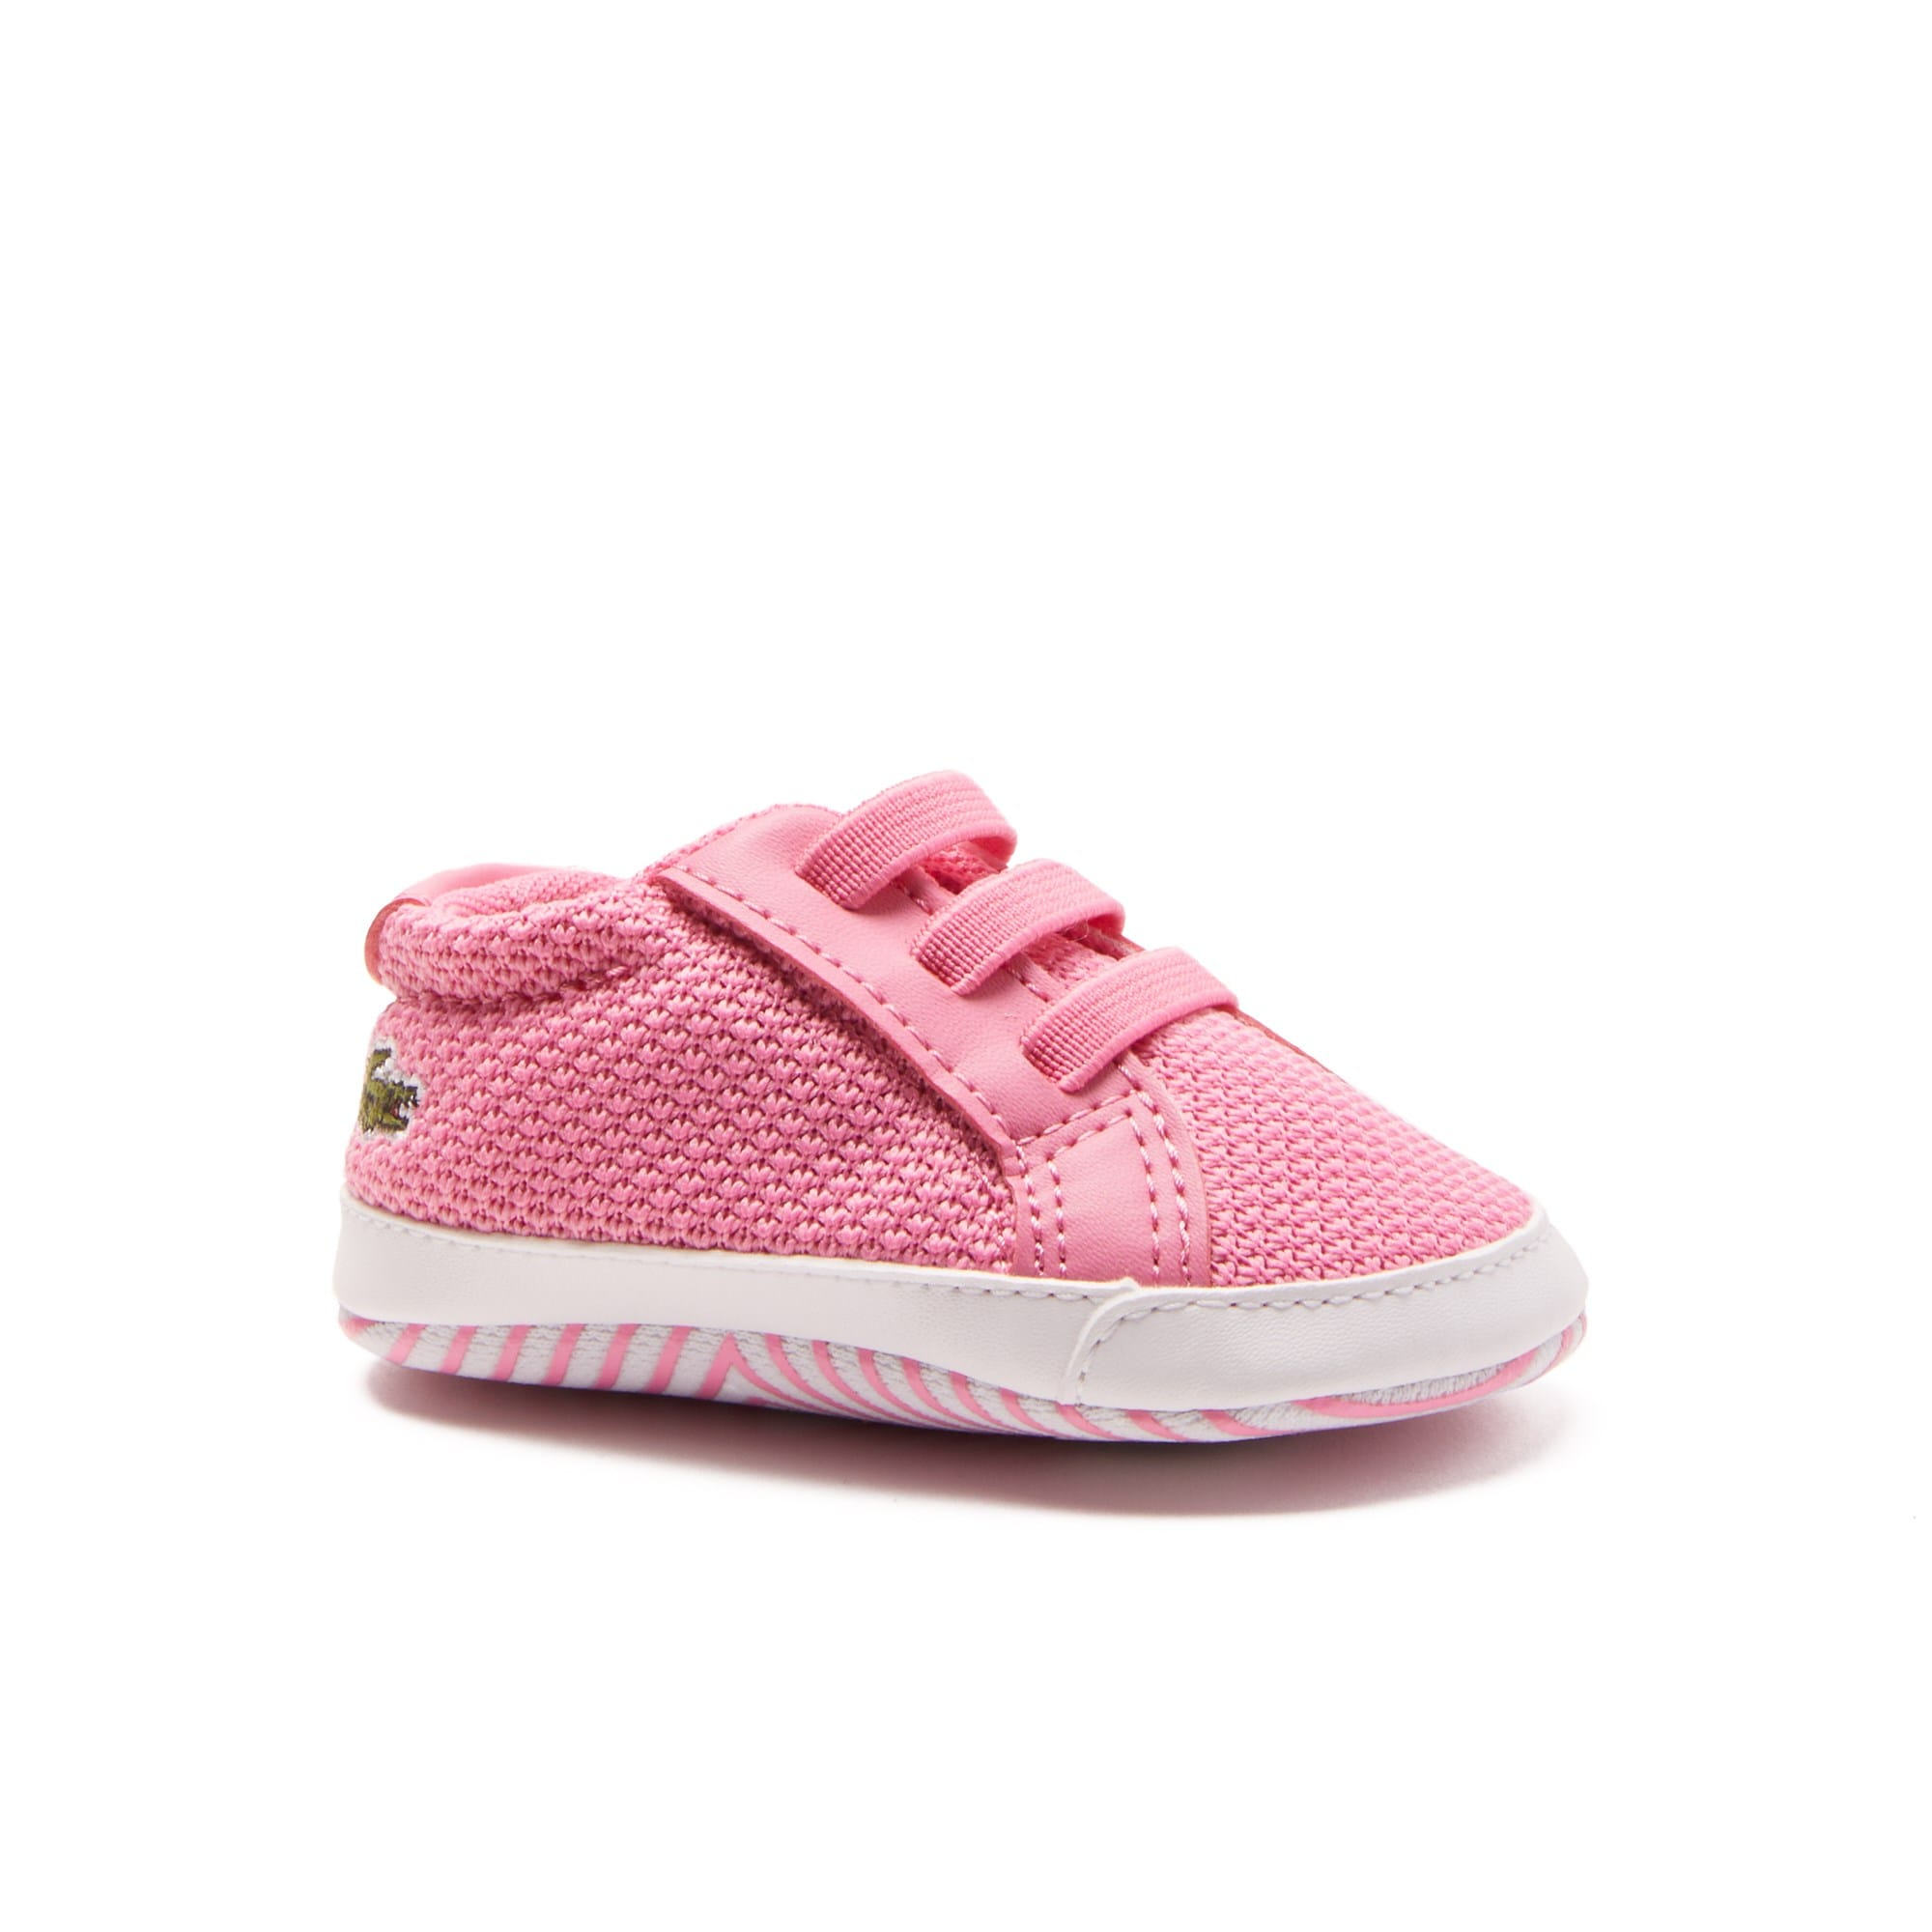 Baby-Sneakers L.12.12 CRIB aus Textil